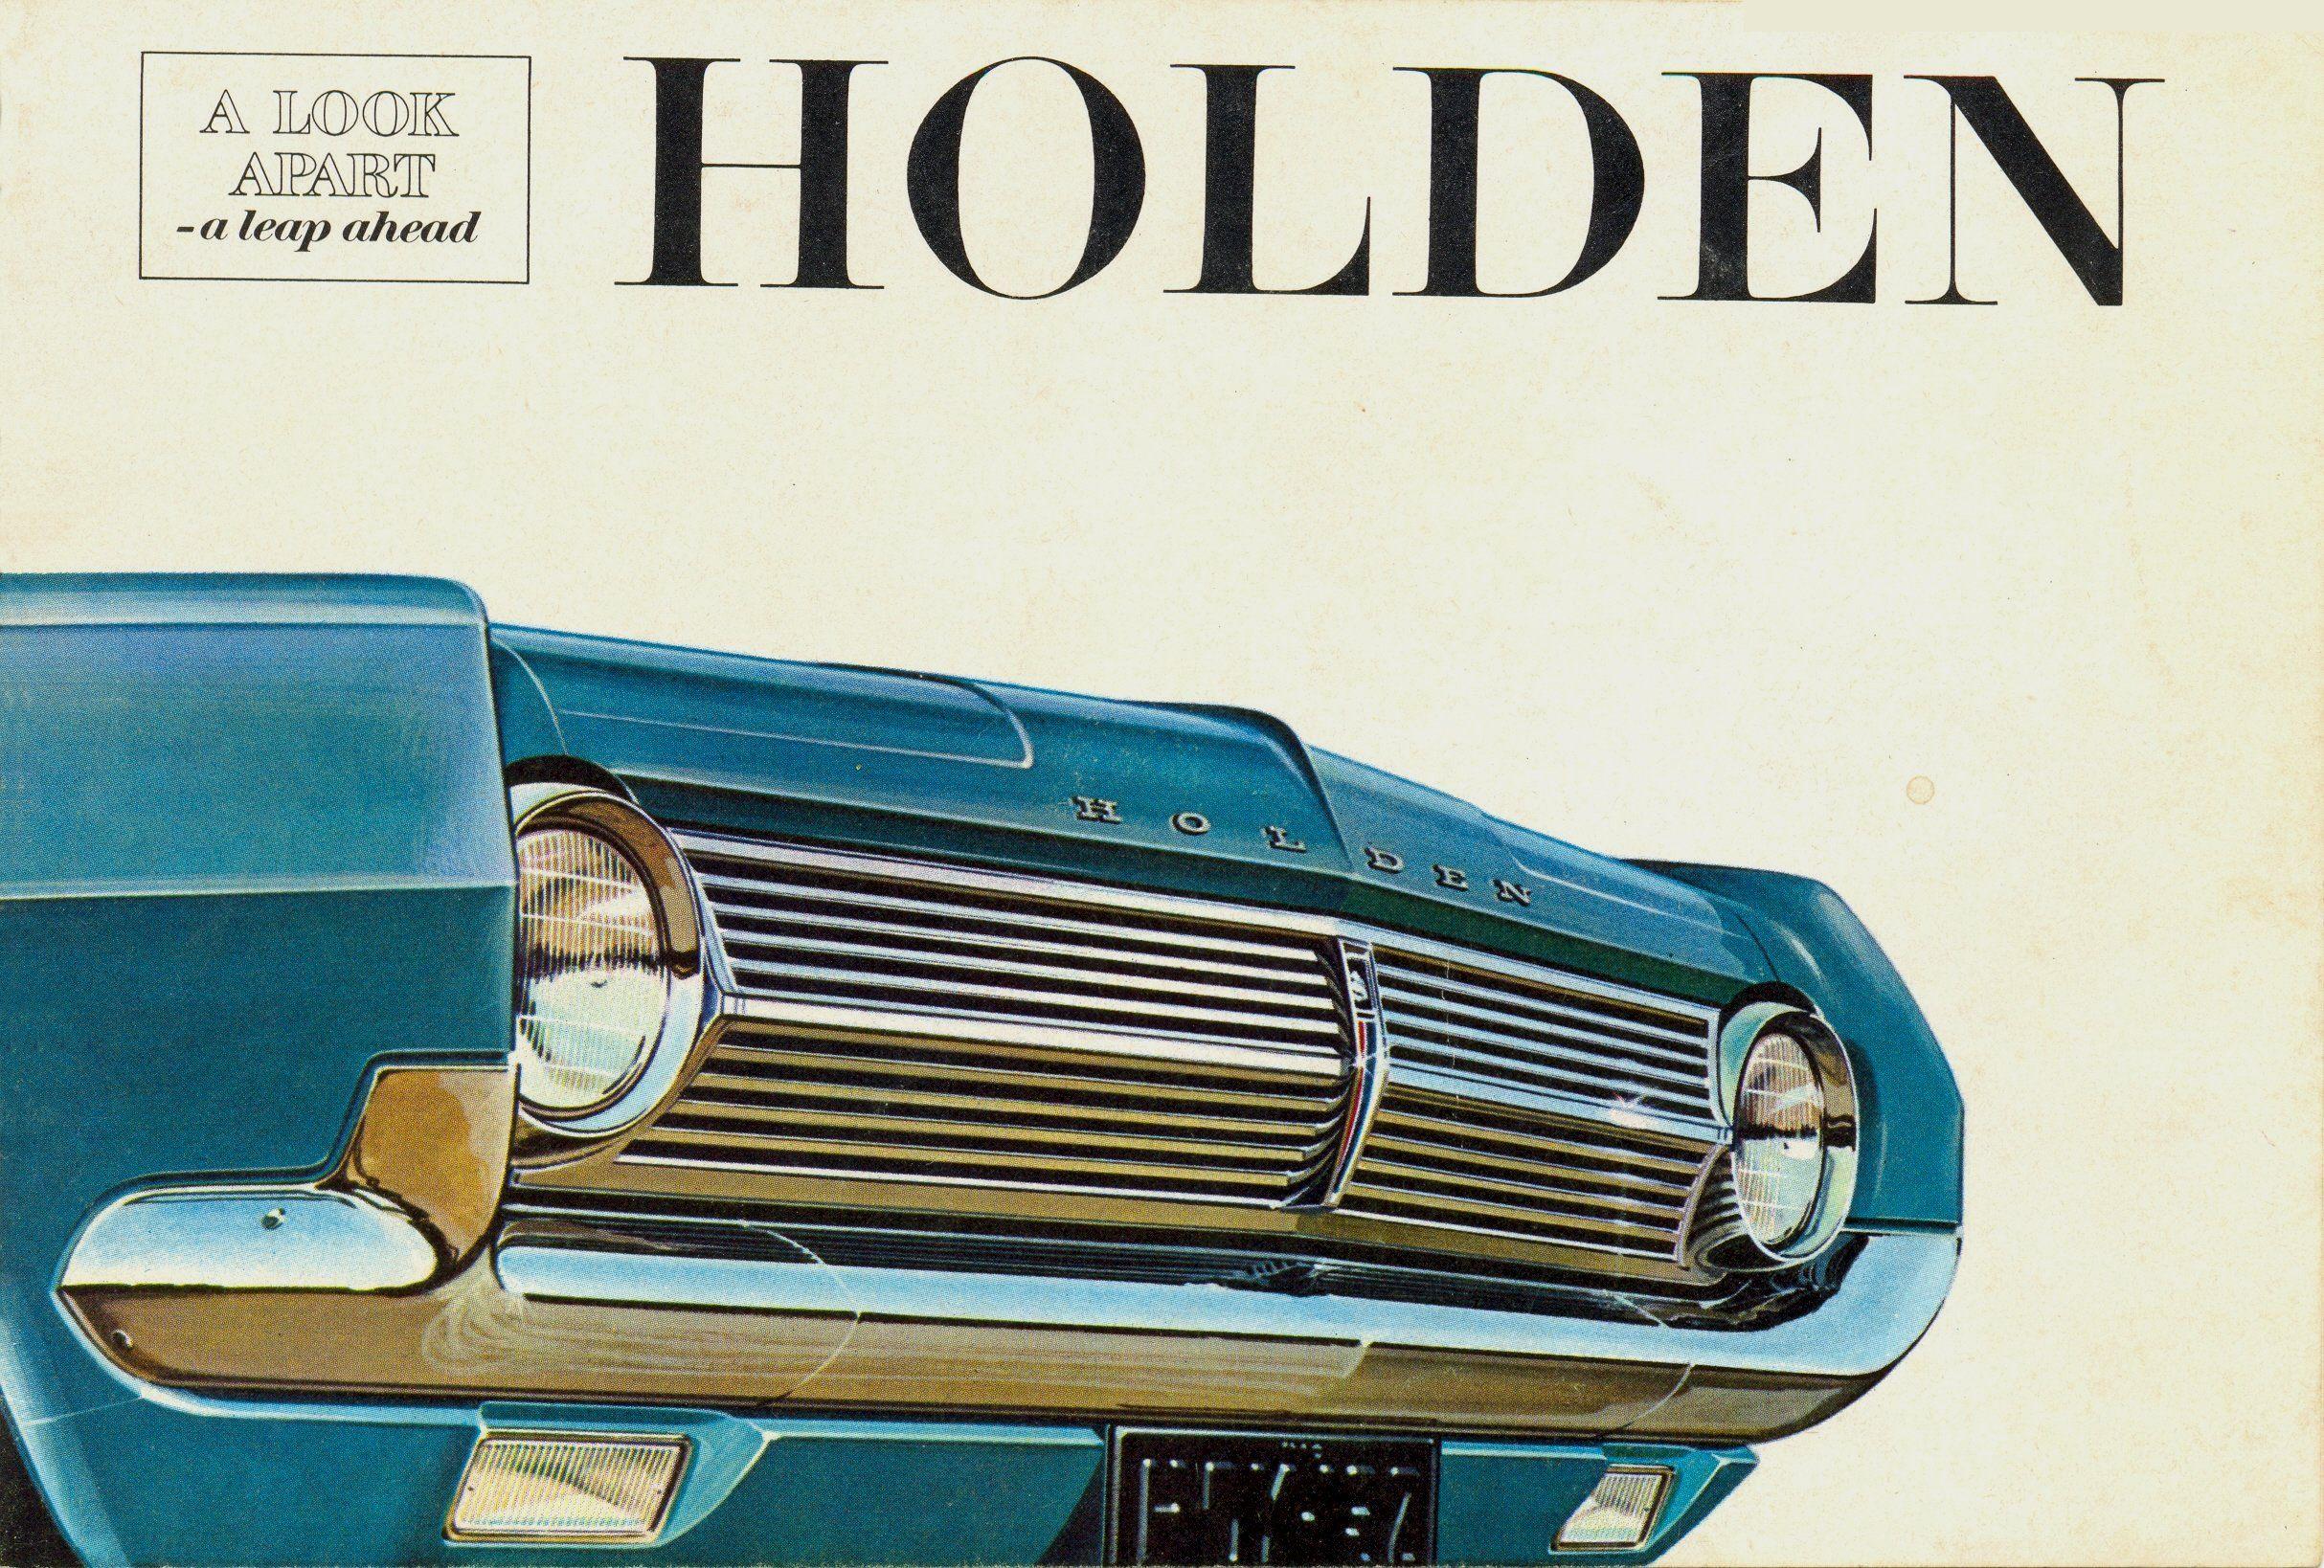 1965 australia - Google Search | Cars | Pinterest | Cars, Car pics ...